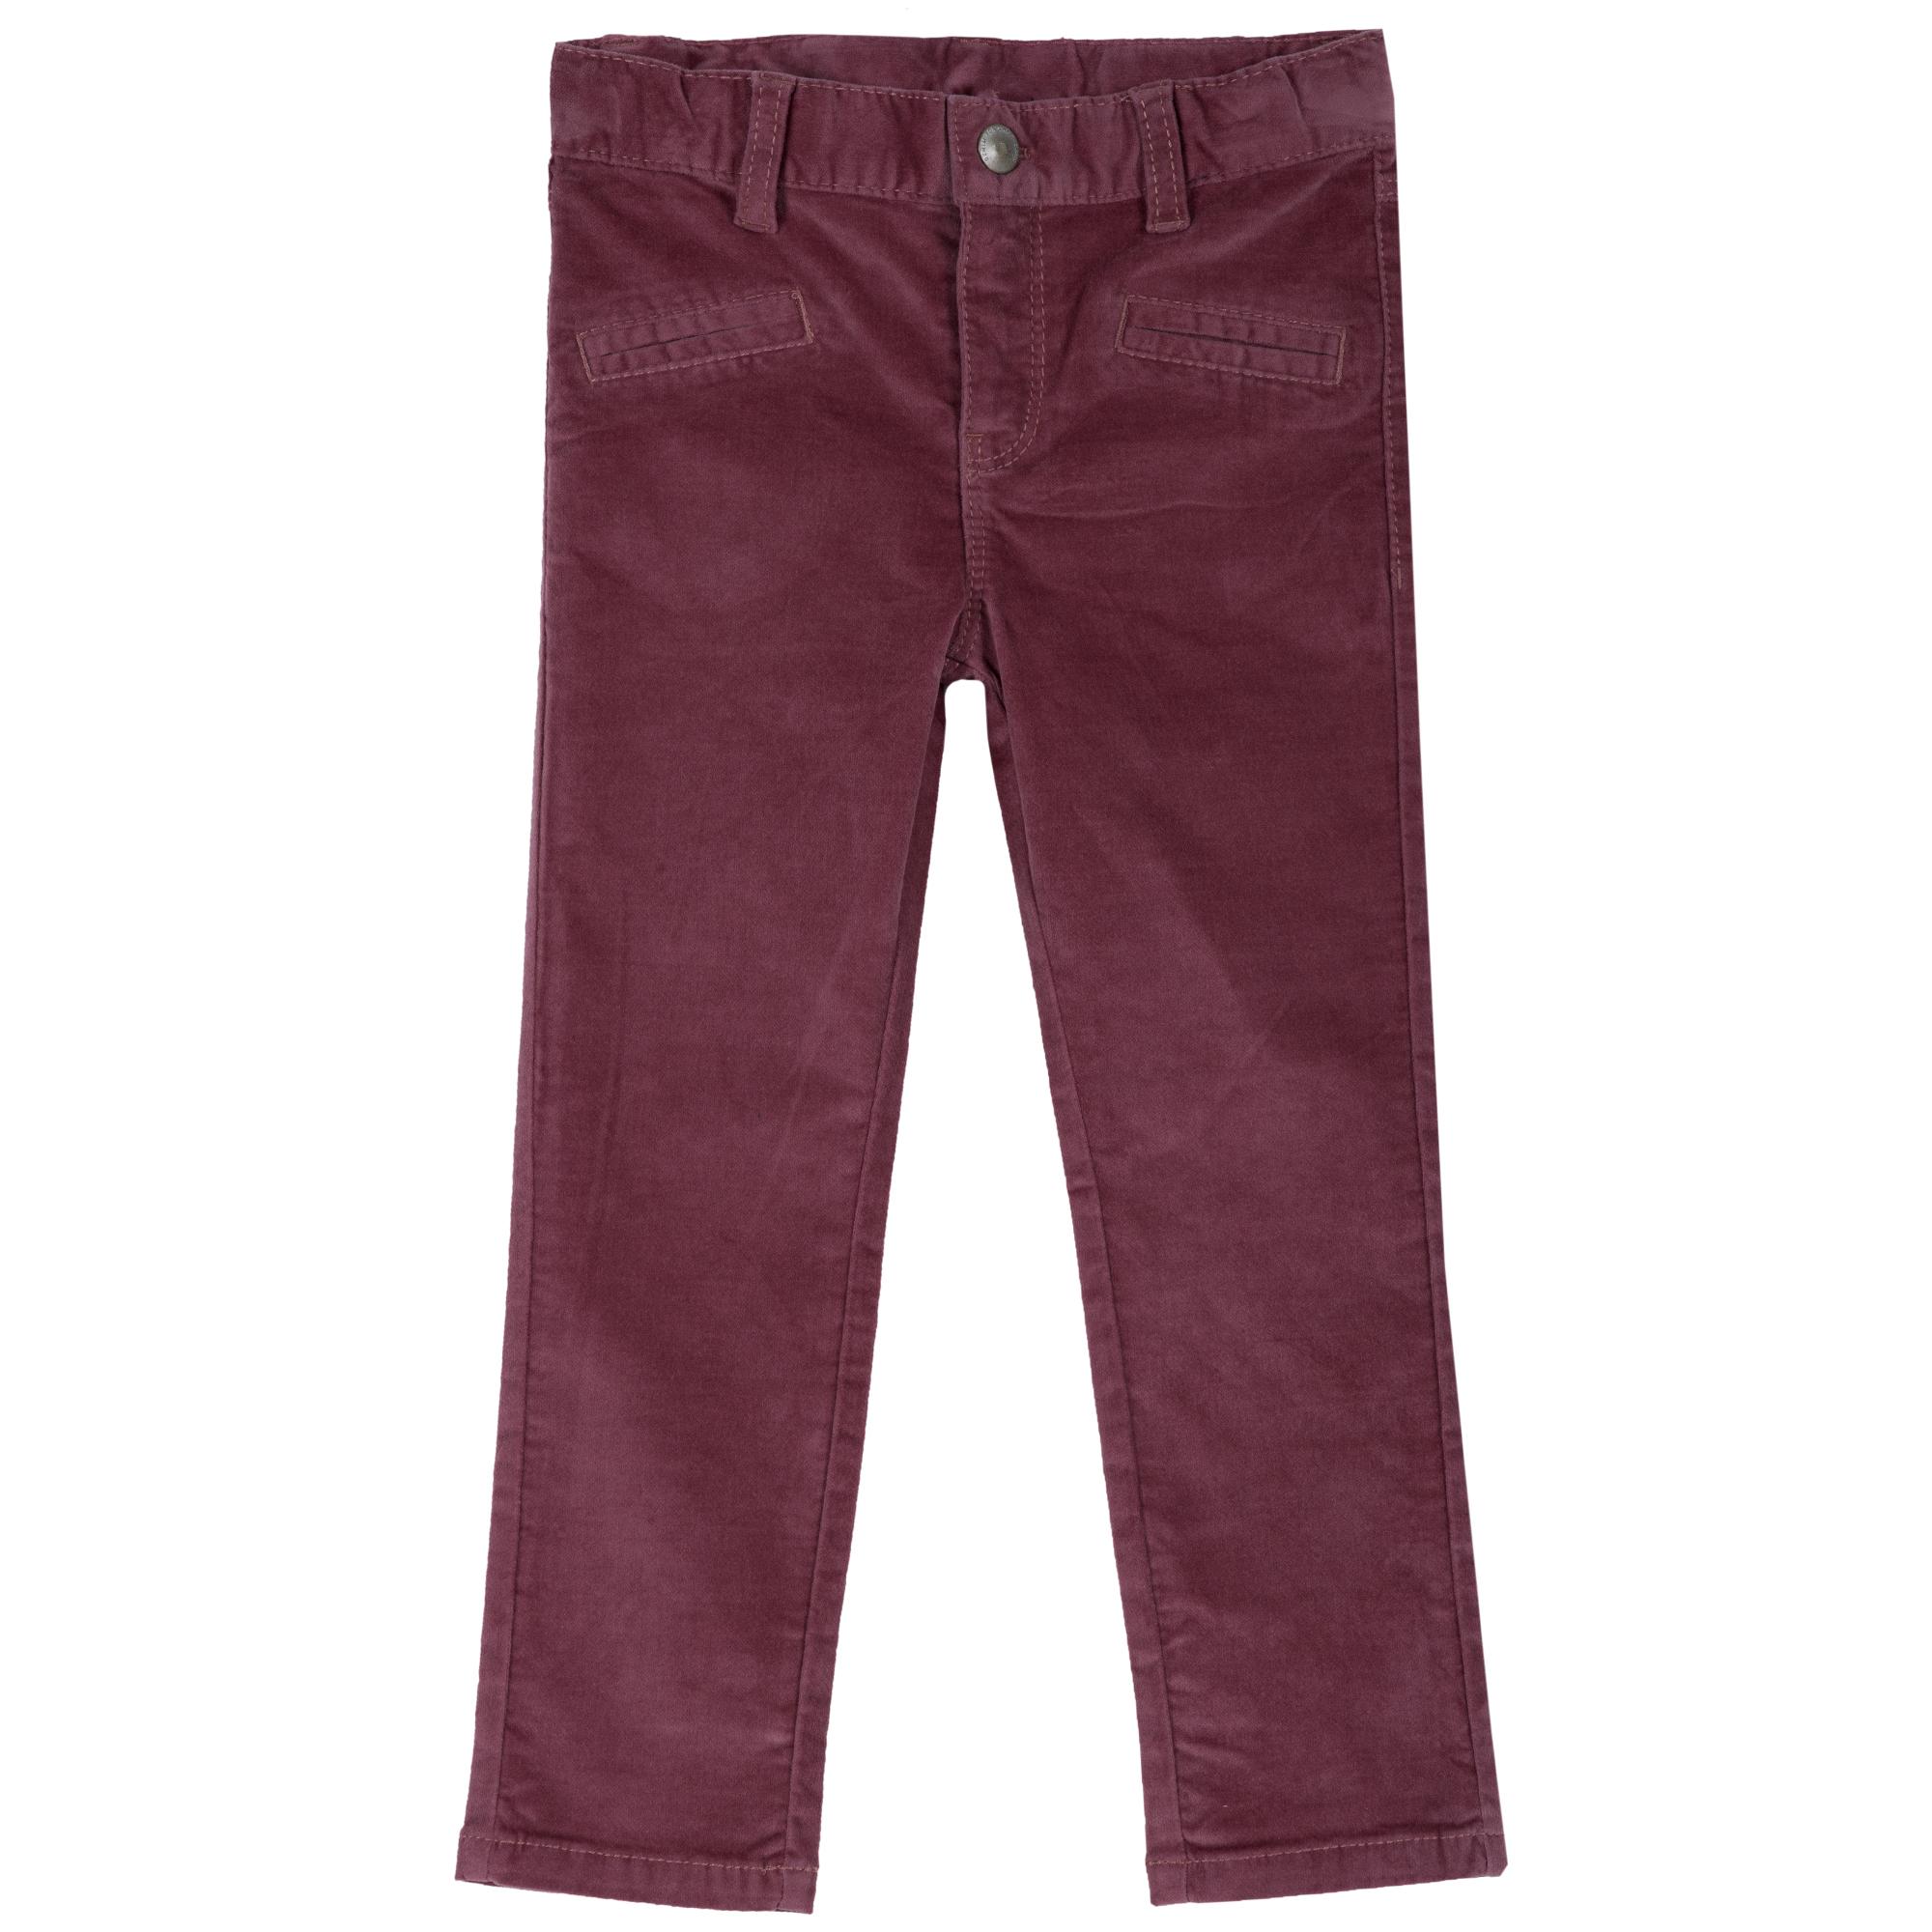 Pantalon copii Chicco, corai